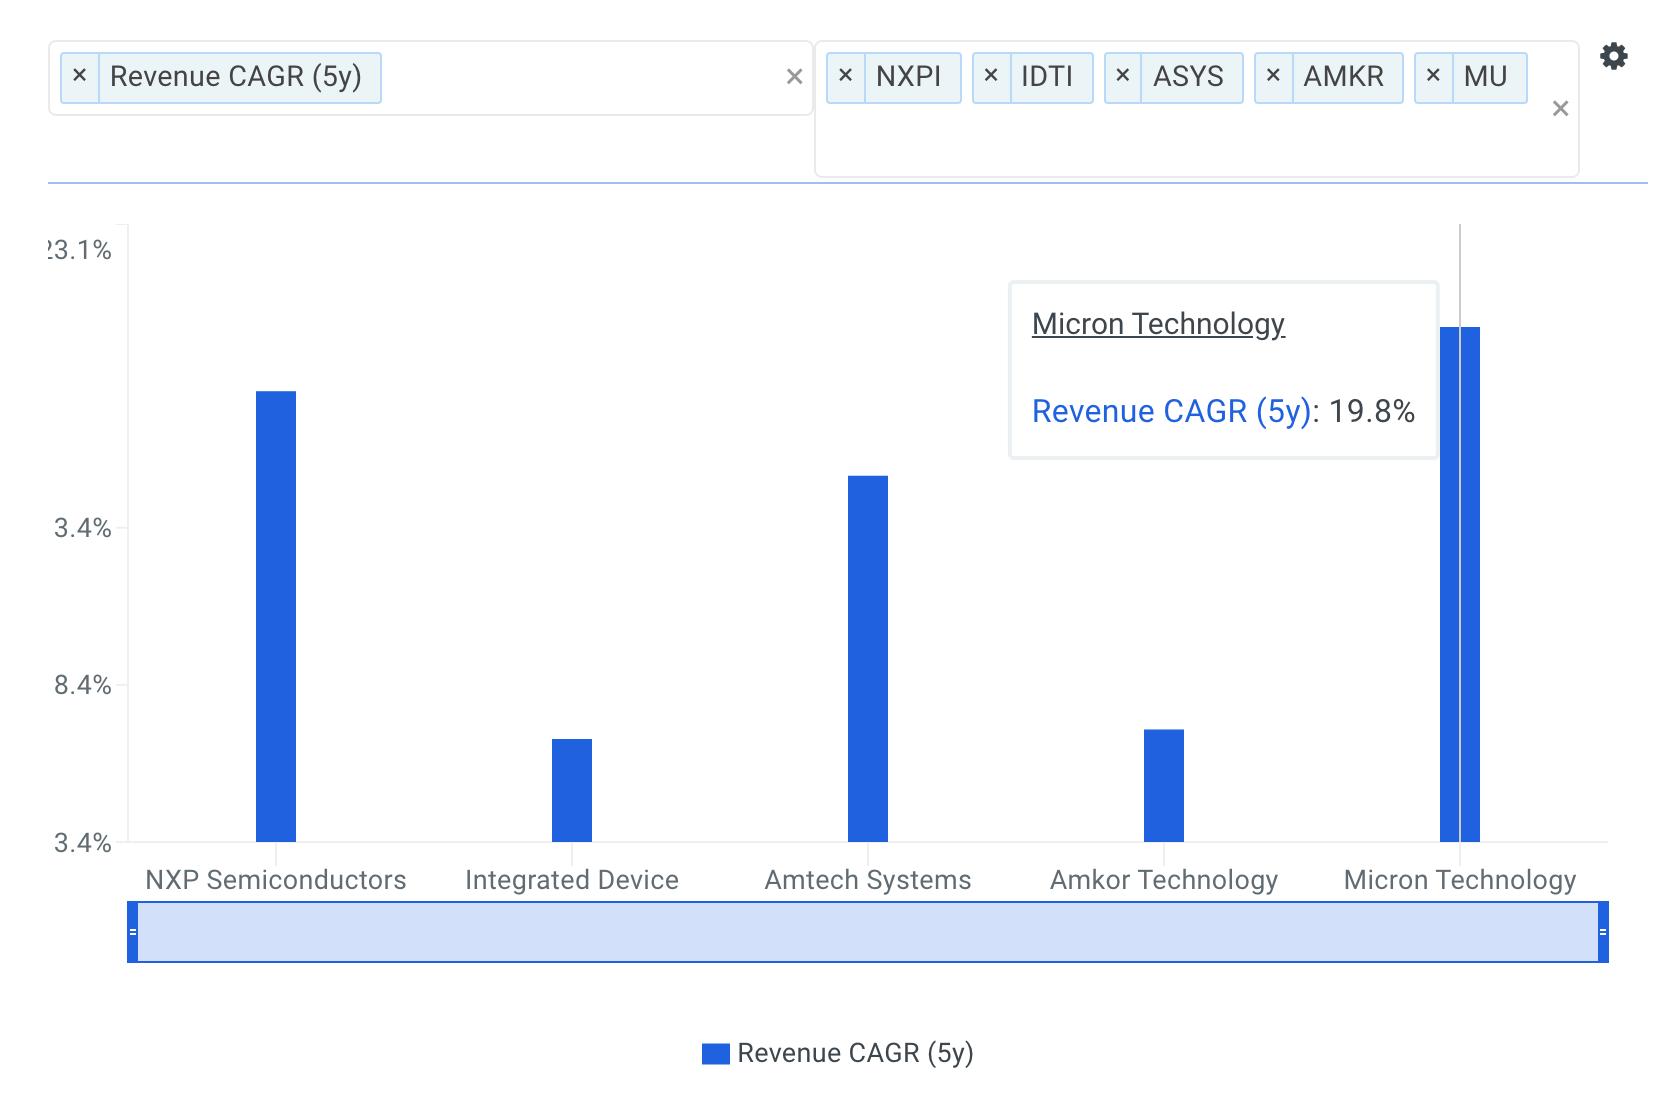 Micron Technology Revenue CAGR vs Peers Chart